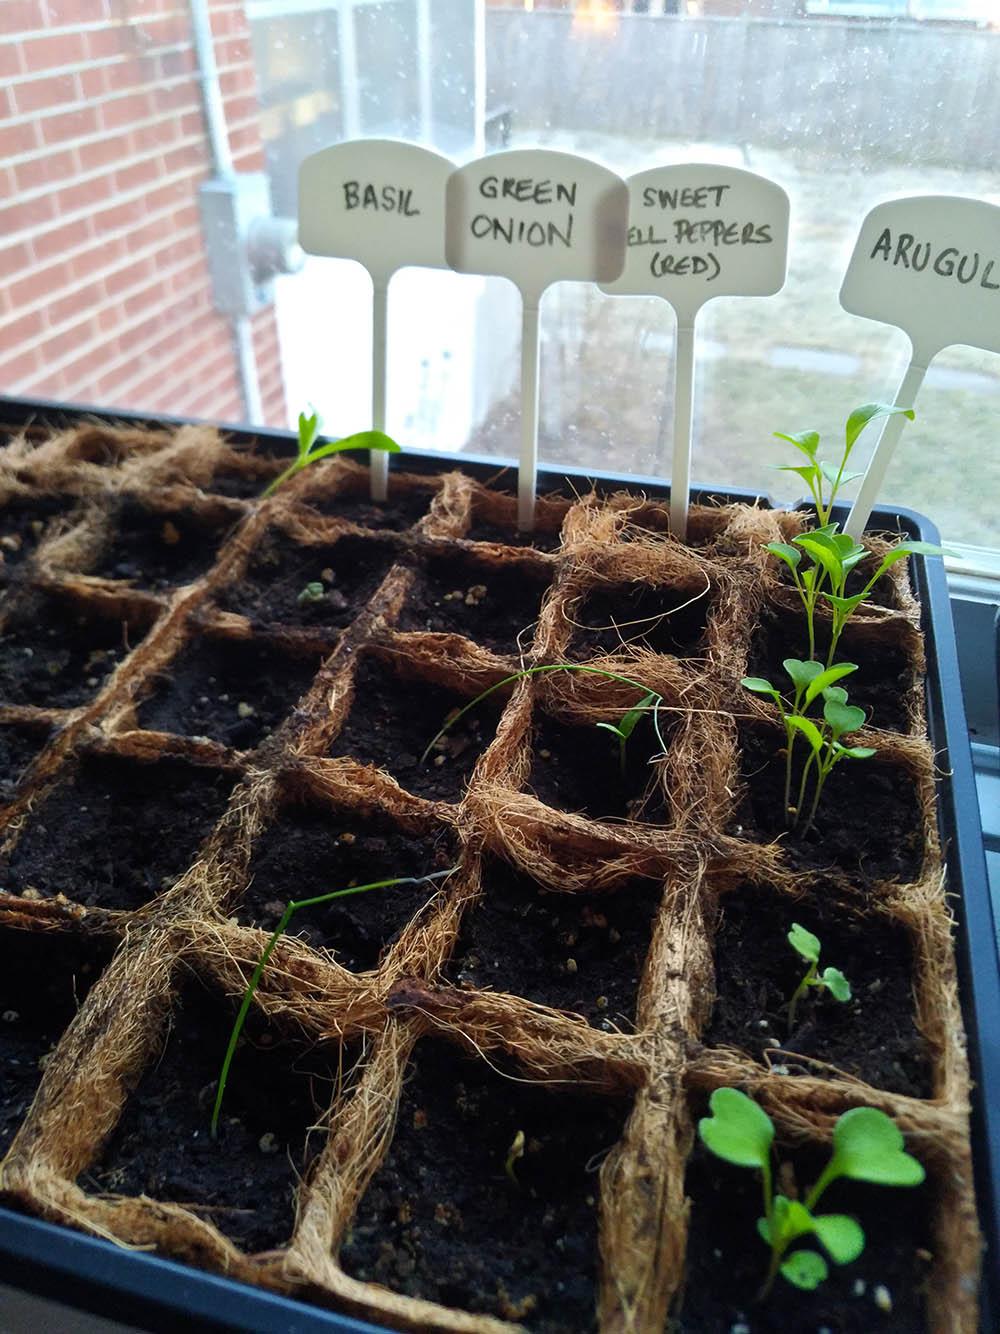 Checking on my seedlings!